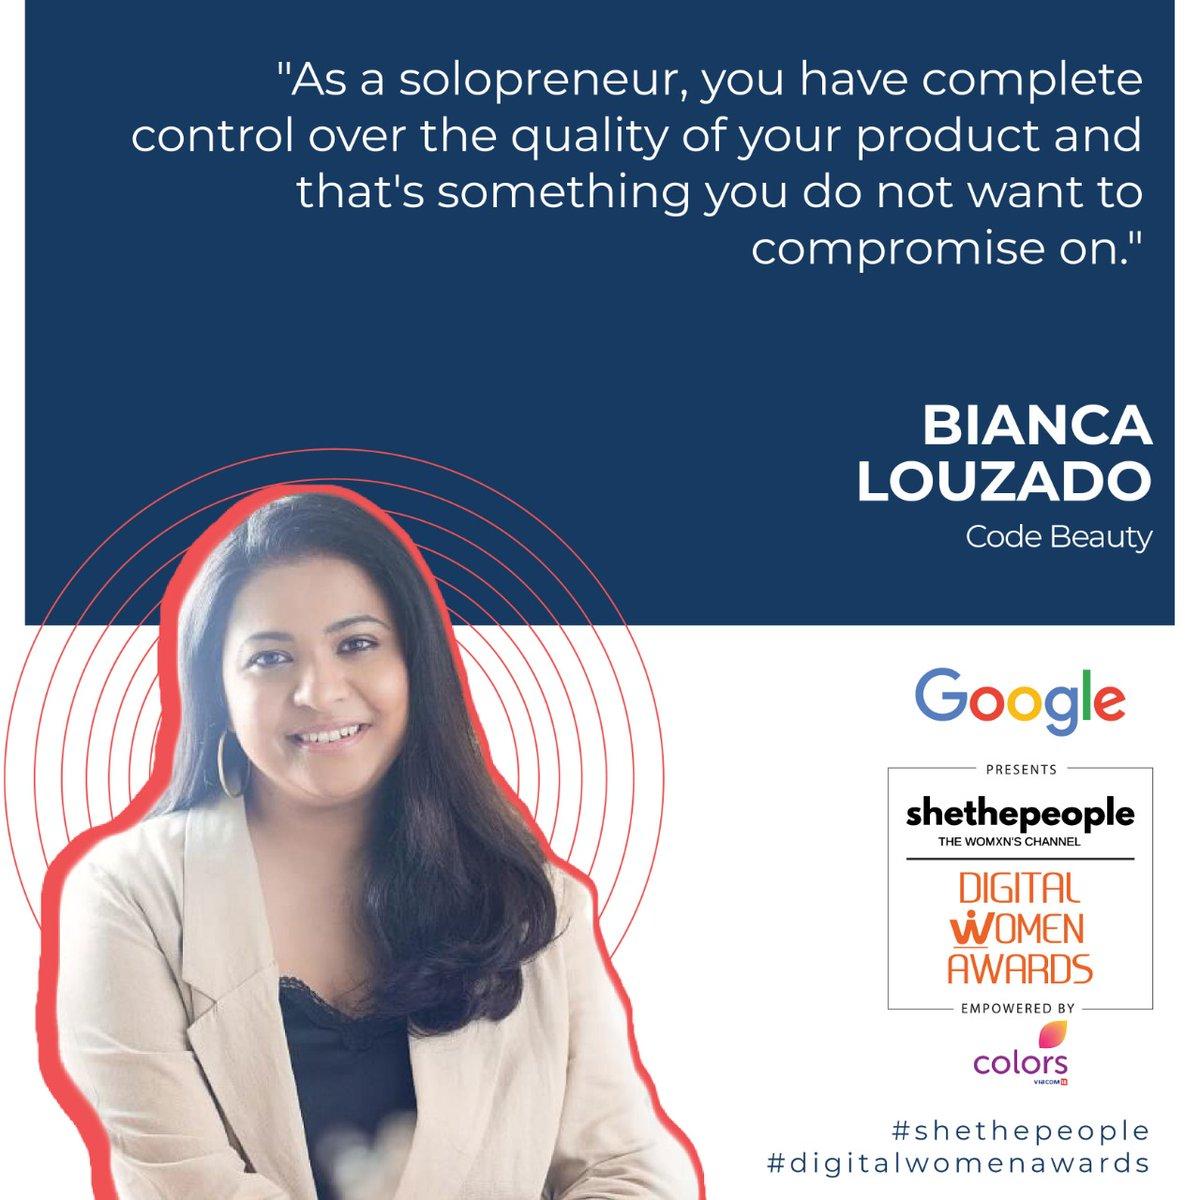 @BiancaLouzado at #DigitalWomenAwards talking about her solopreneur journey